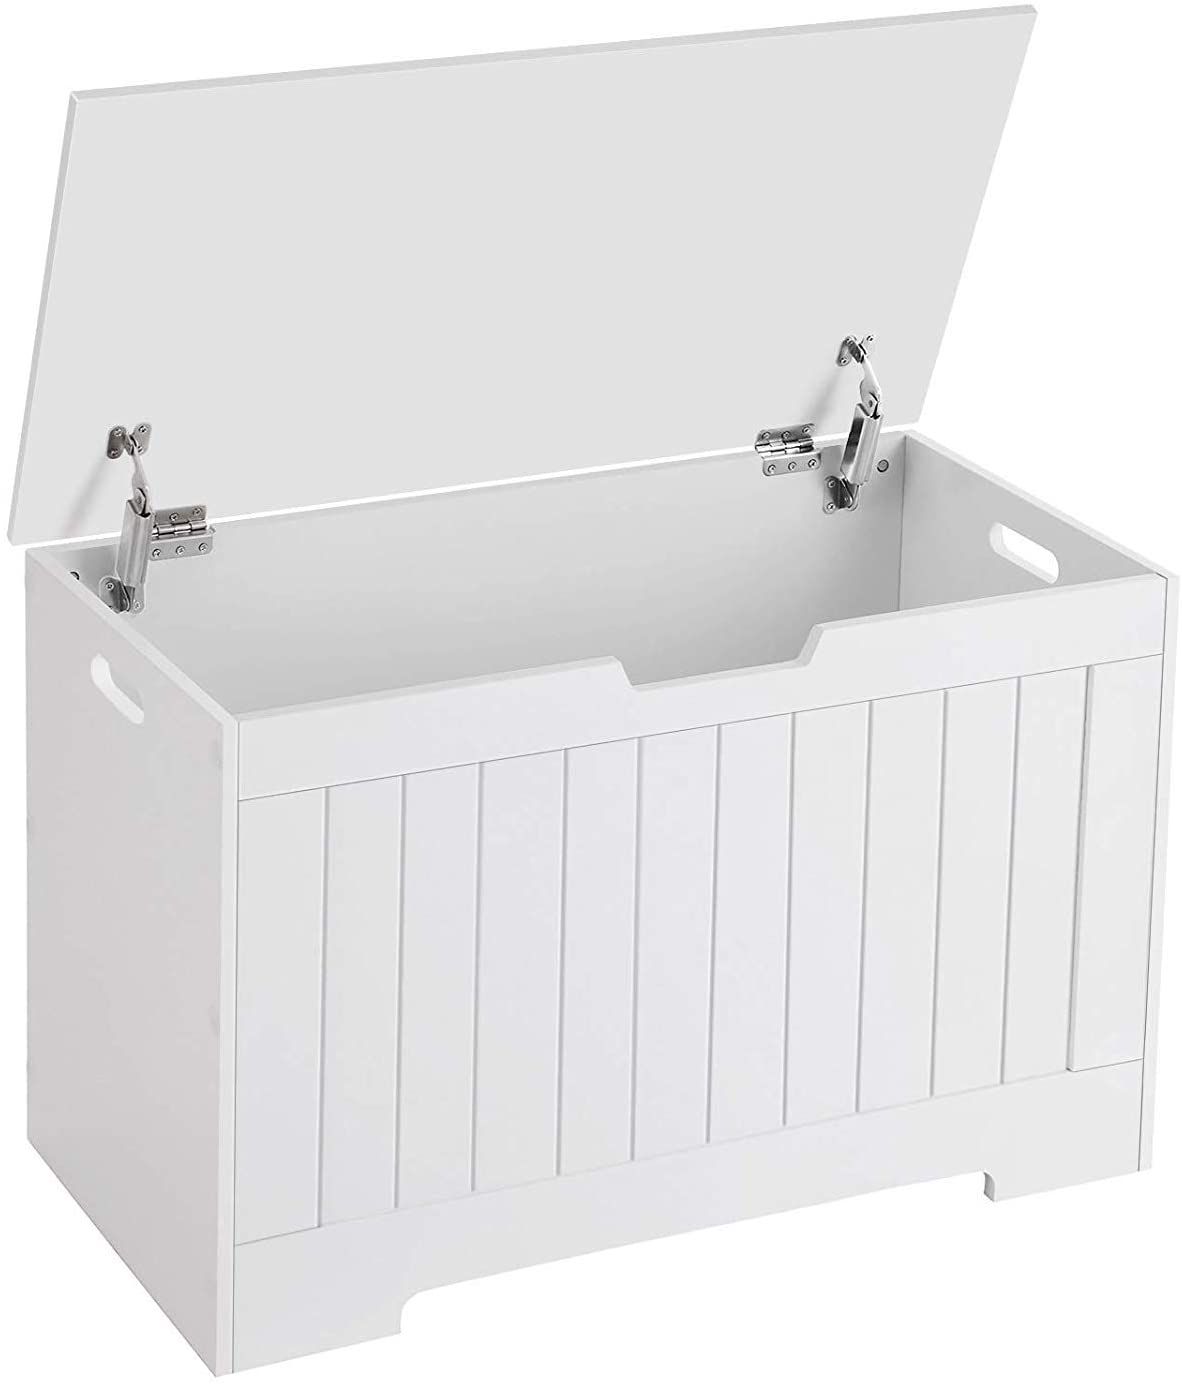 Knocbel Flip-Top Toy Box, Storage Organizer Kids Chest Storage Bench with Lid & 2 Safety Hinges, 29.9